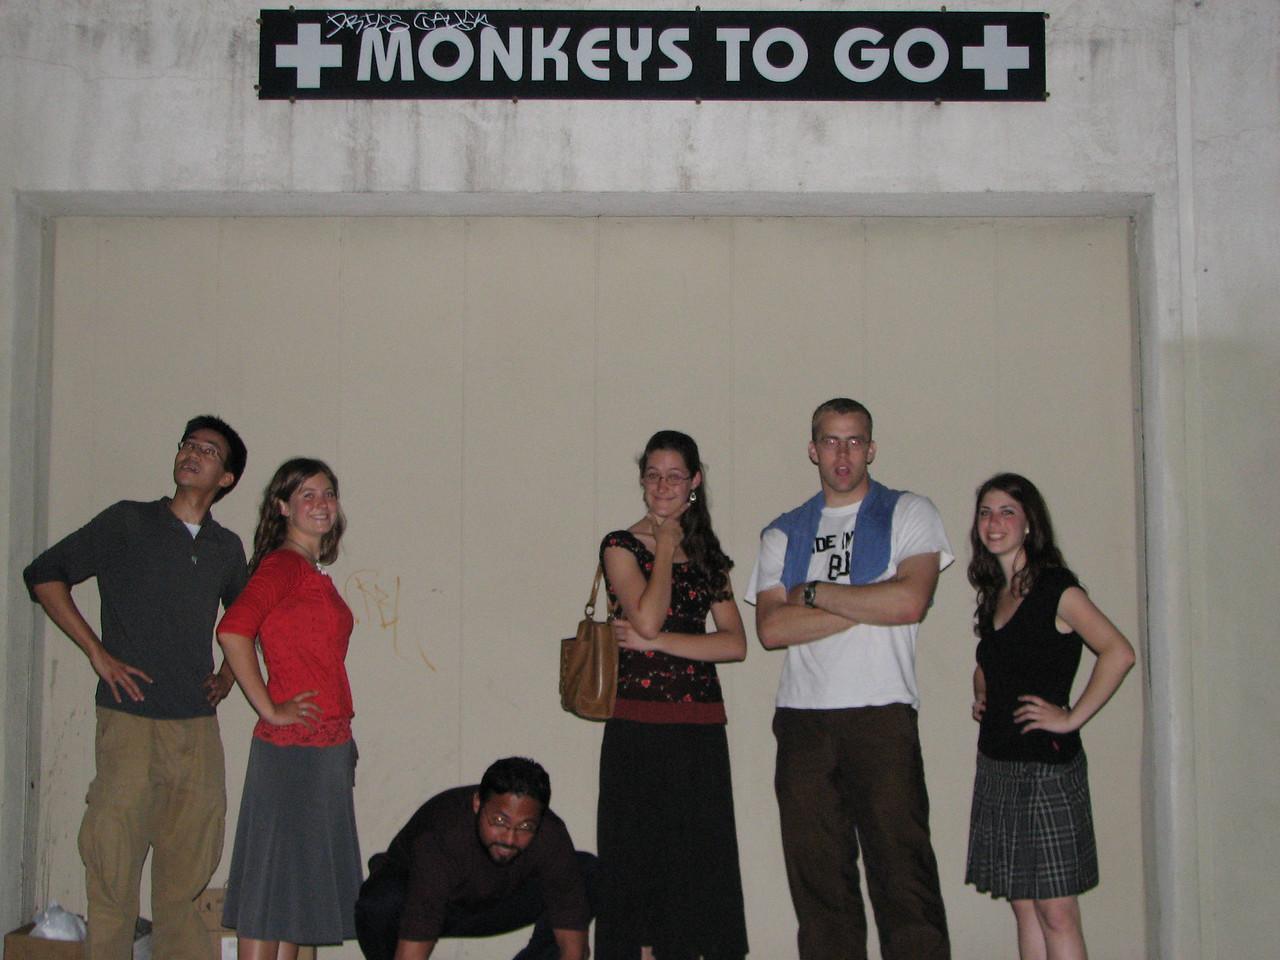 2008 04 28 Mon - Monkeys to go 1 - Ben Yu, Ayelet Hendren, Isai Garcia, Laura Hannesson, Caleb Campbell, & Roni Hendren